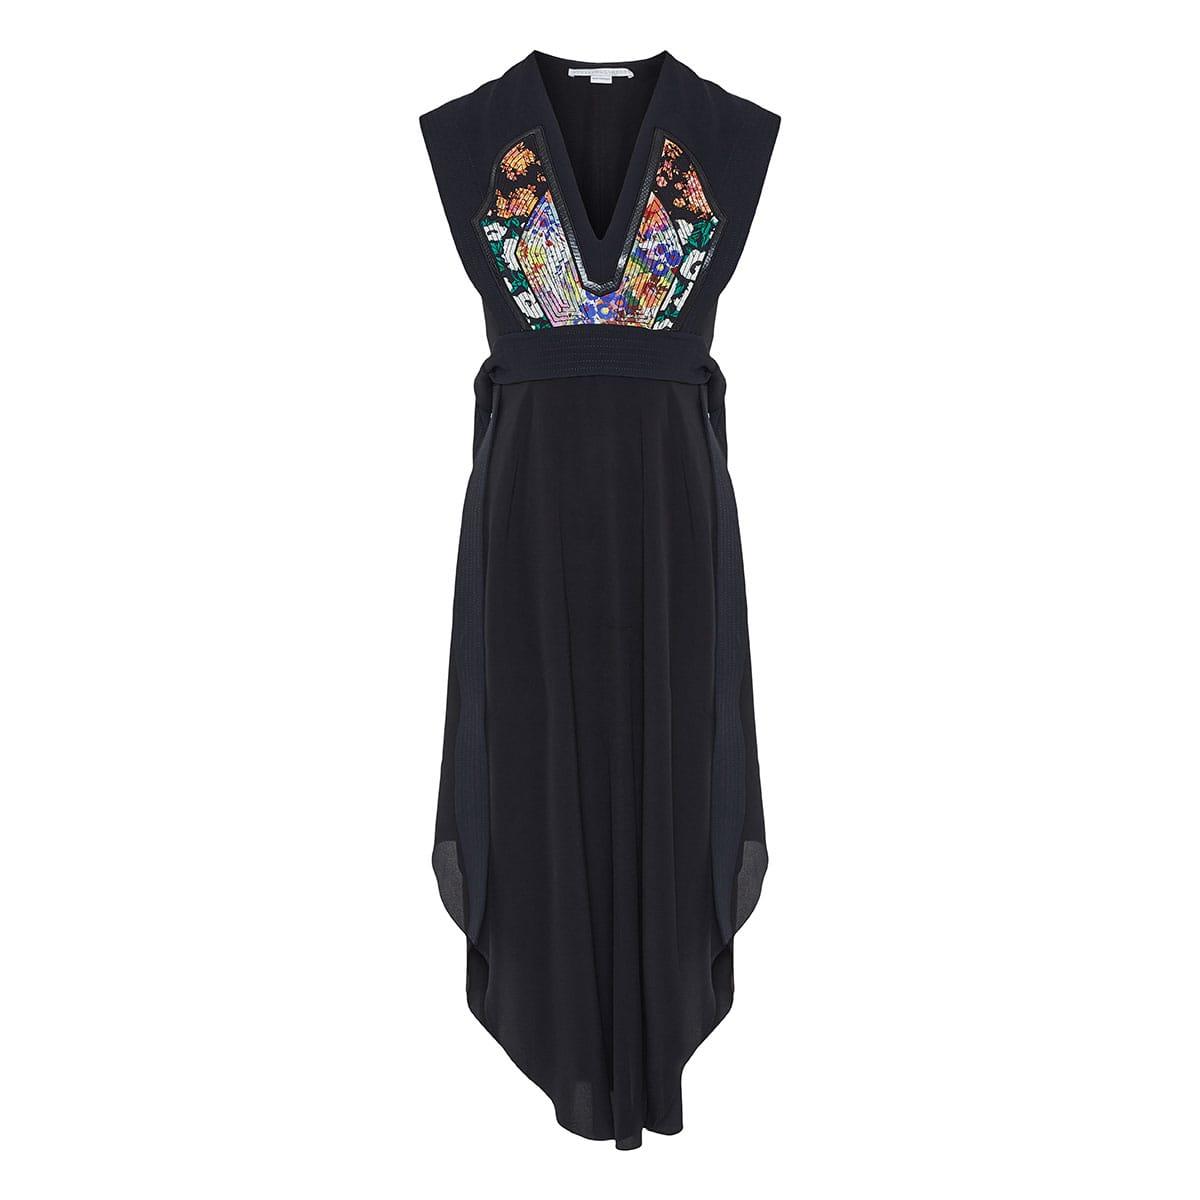 Midi dress with patchwork panel